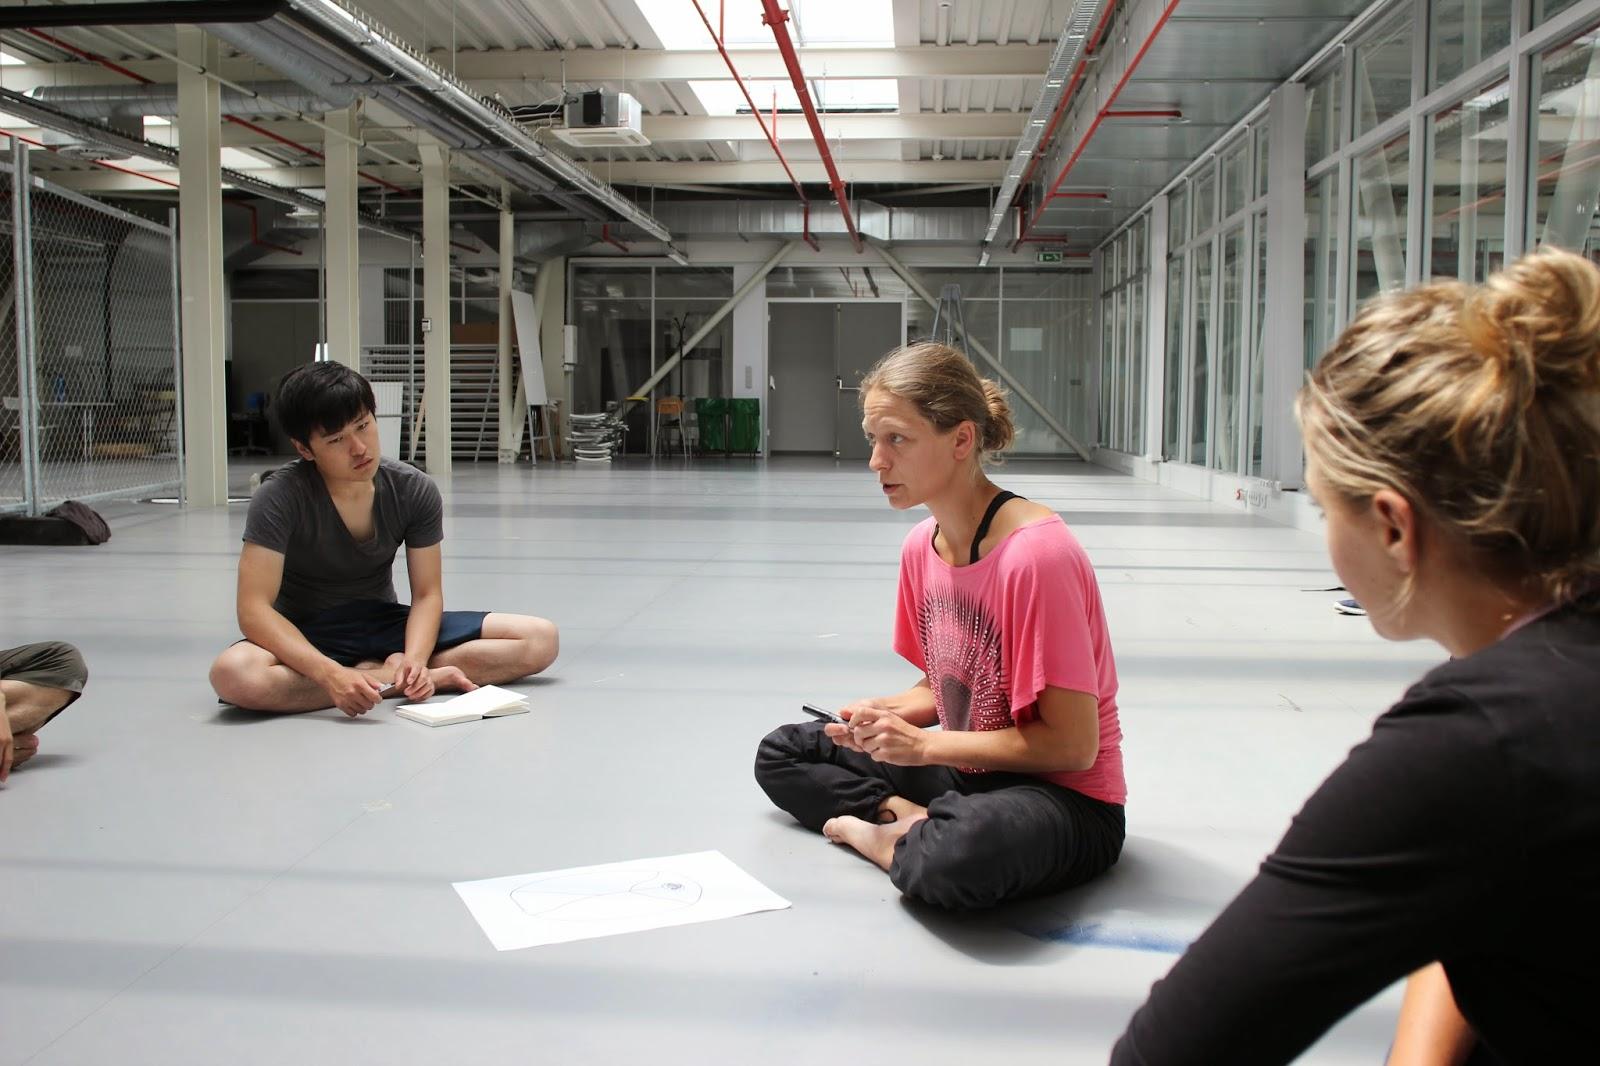 ArtCamp 2014, Tělo, pohyb, tanec, body, movement, dance